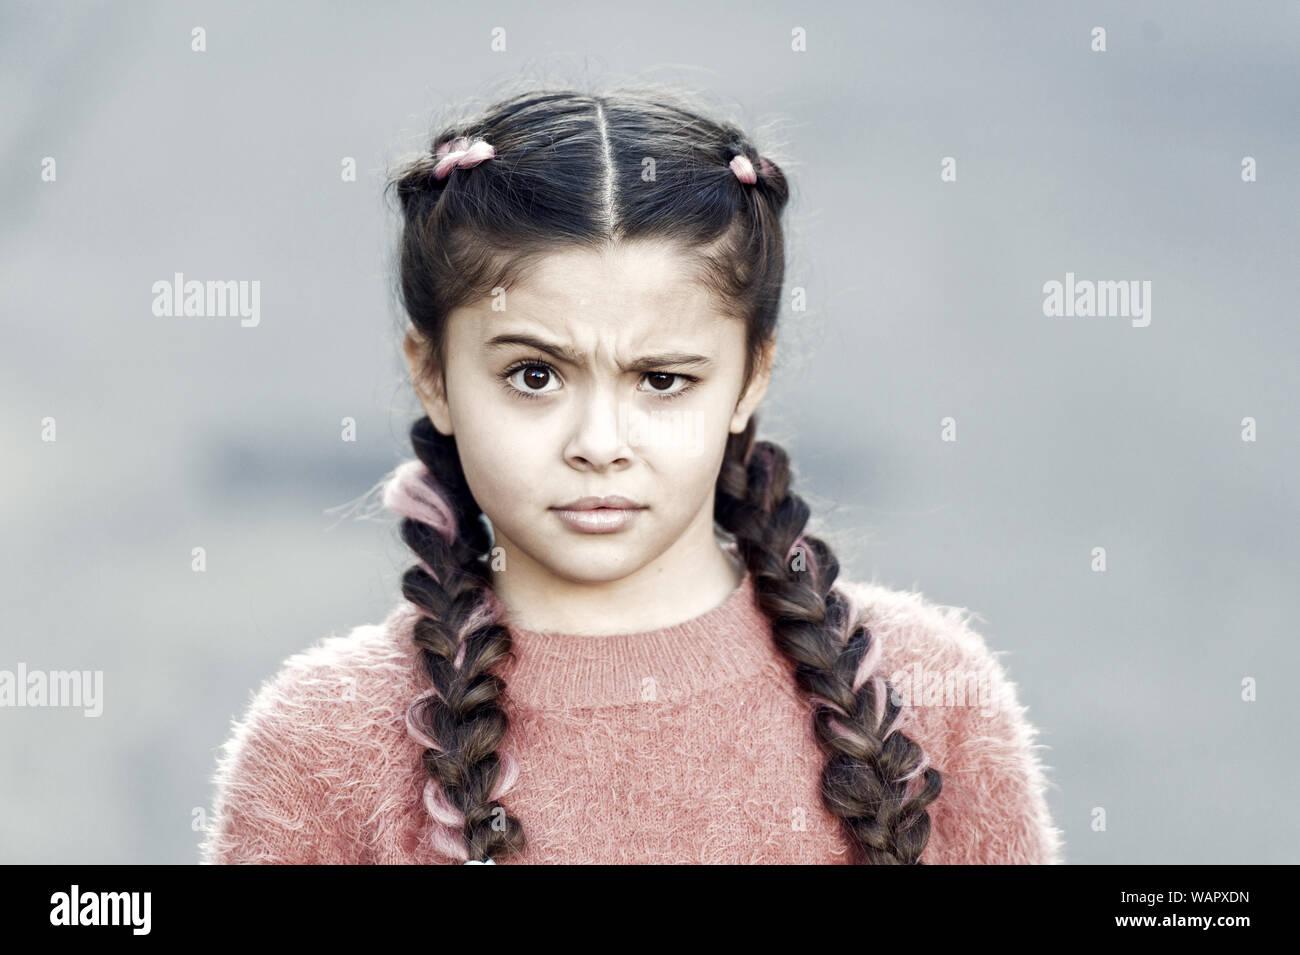 Suspicious Look Kanekalon Strand In Braids Of Child